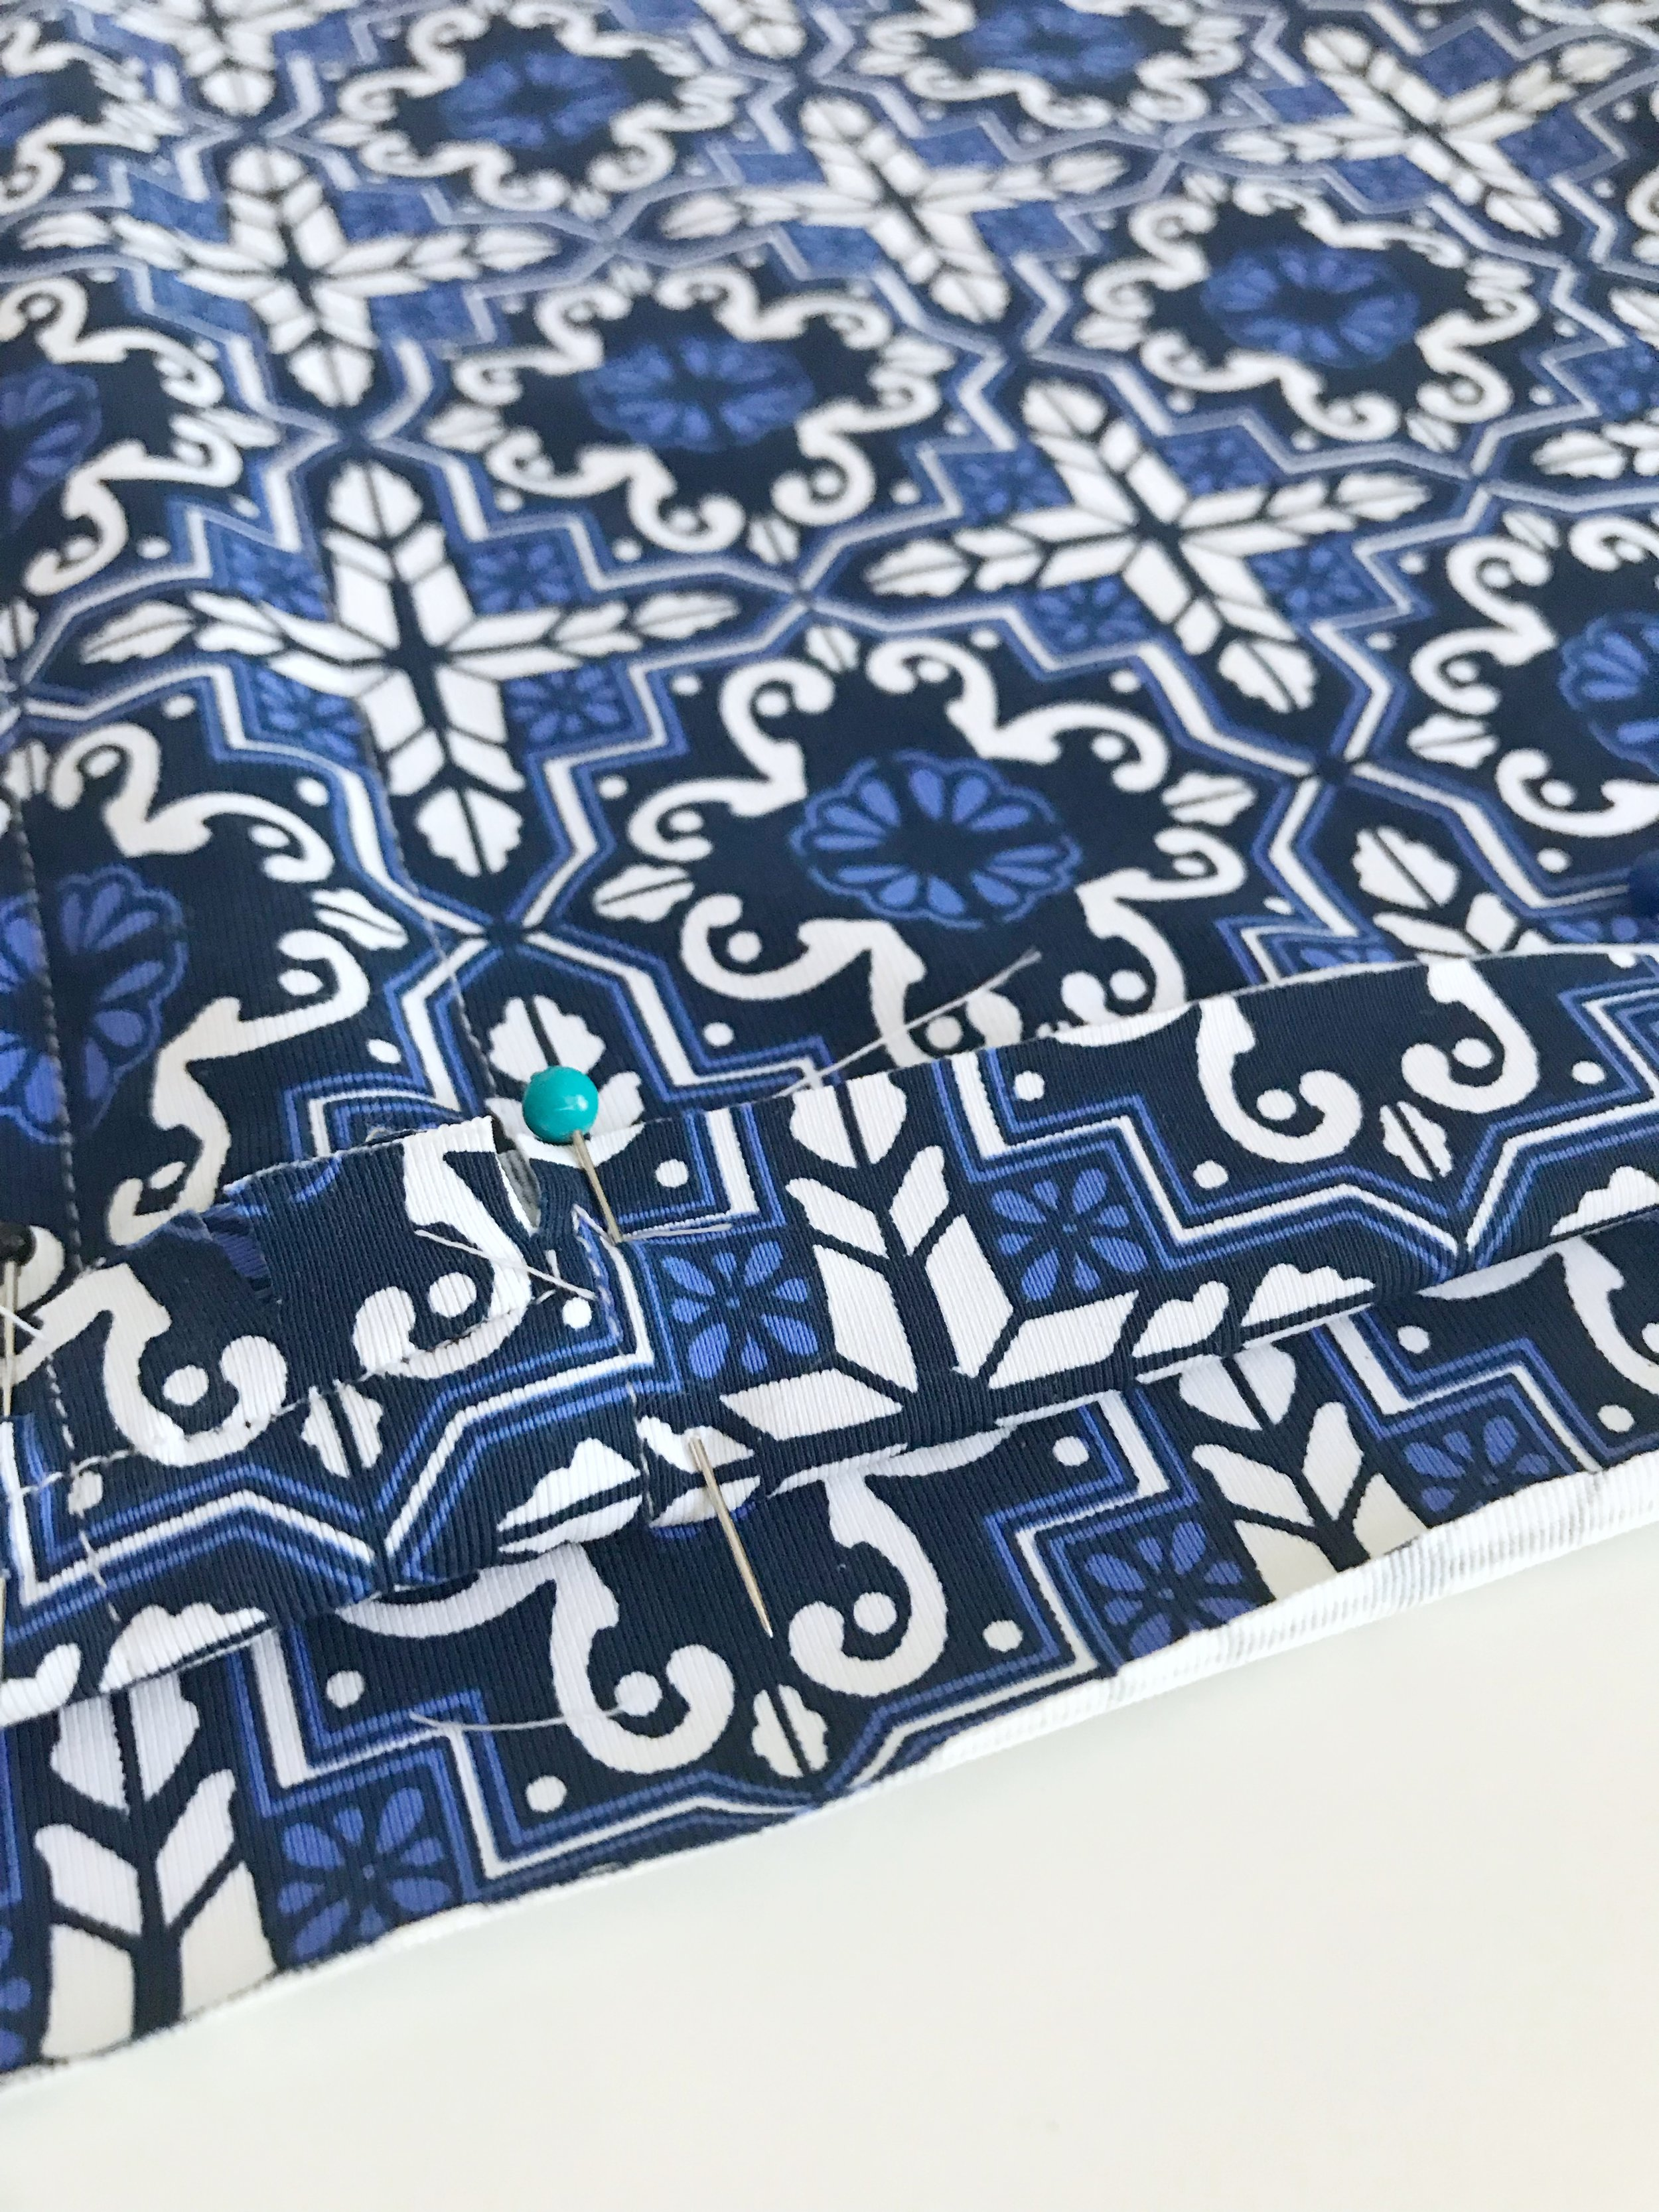 friday pattern company sewing pattern hack.jpg